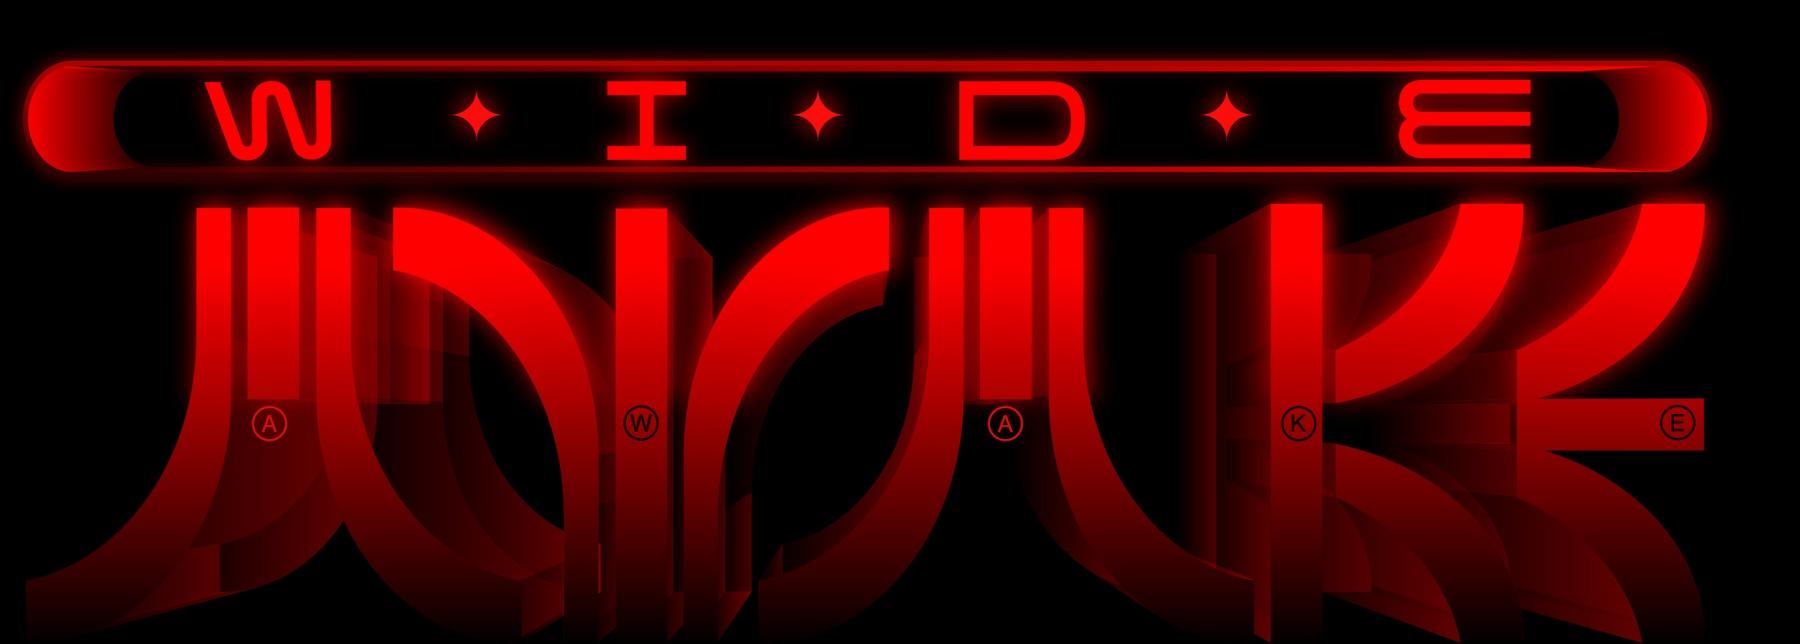 logo.6481ffe4.png